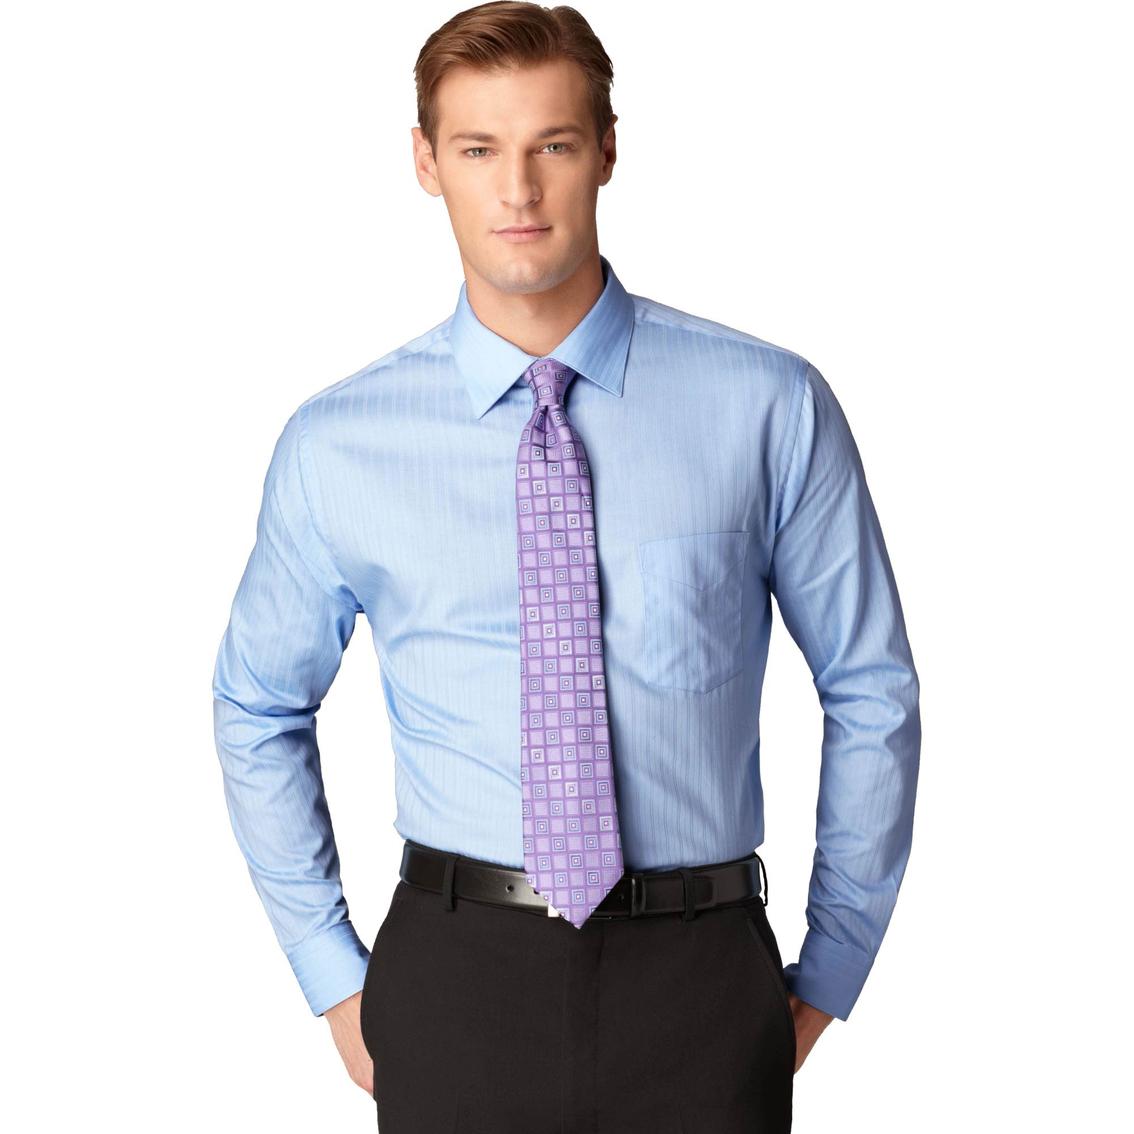 Arrow Satin Twill Dress Shirt Dress Shirts Apparel Shop The